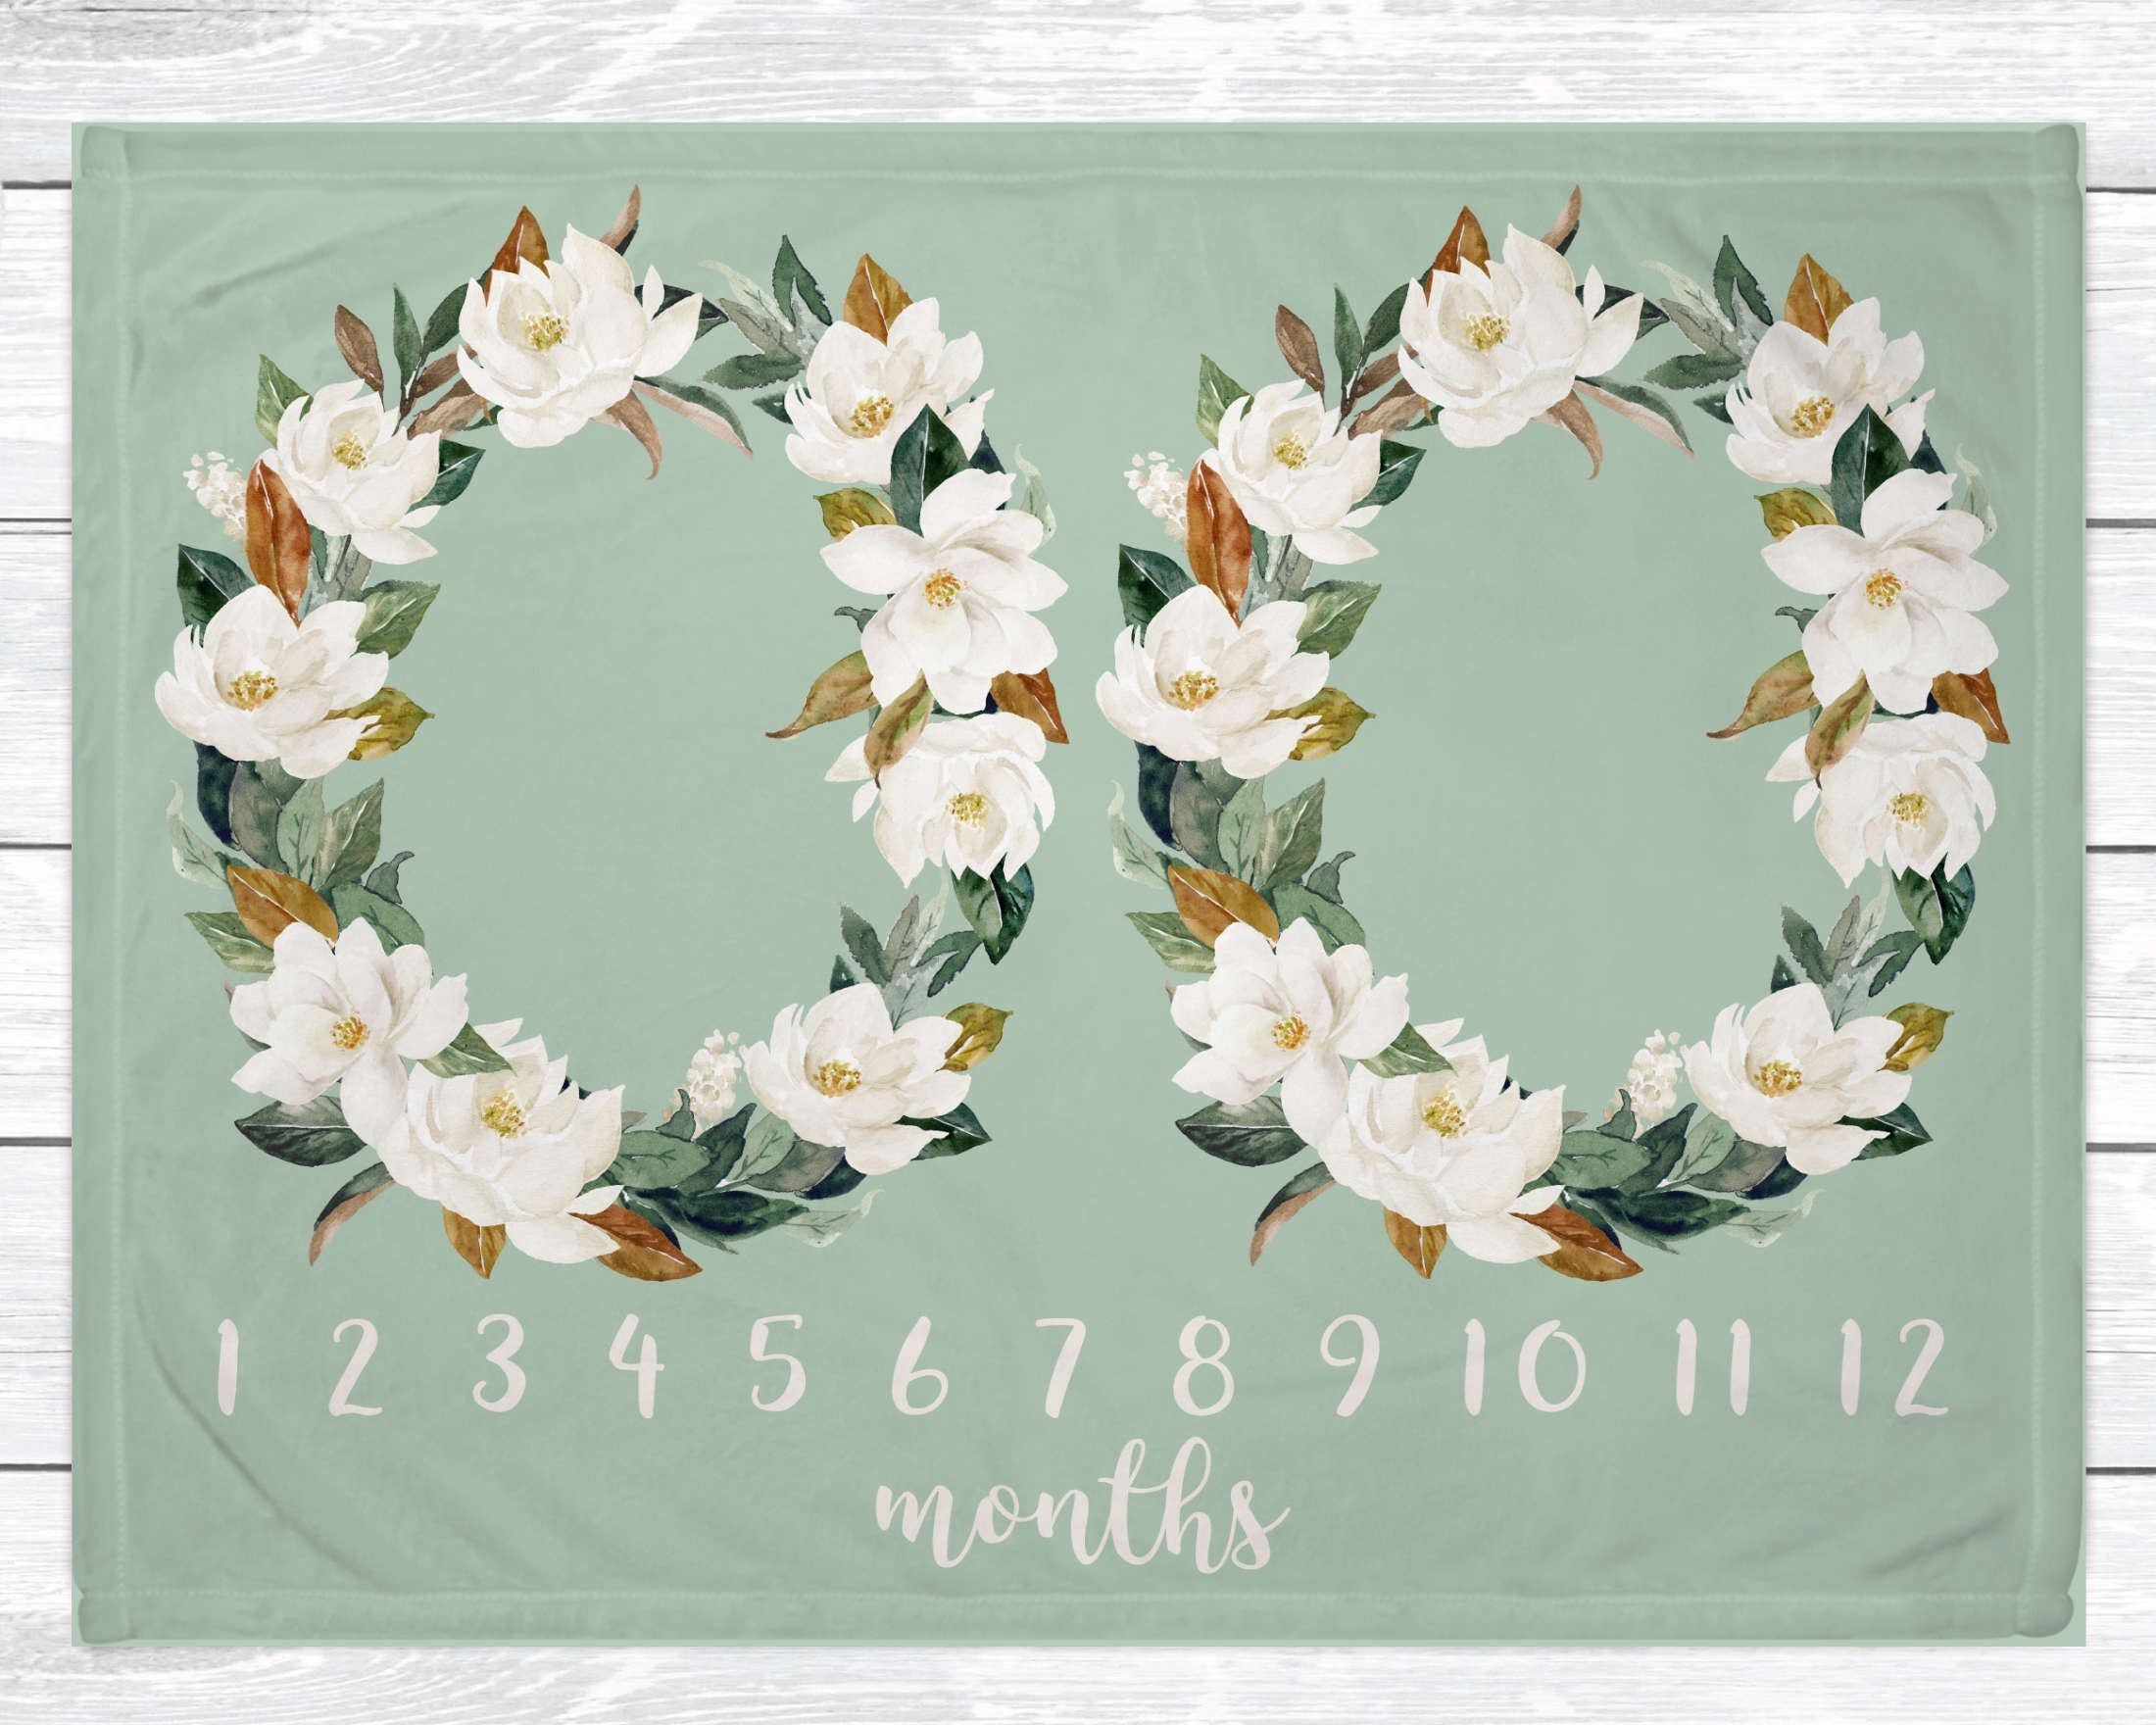 Twin Milestone Blanket Magnolia Flowers Blanket Gender Etsy In 2020 Baby Milestone Blanket Milestone Blanket Twin Baby Girls